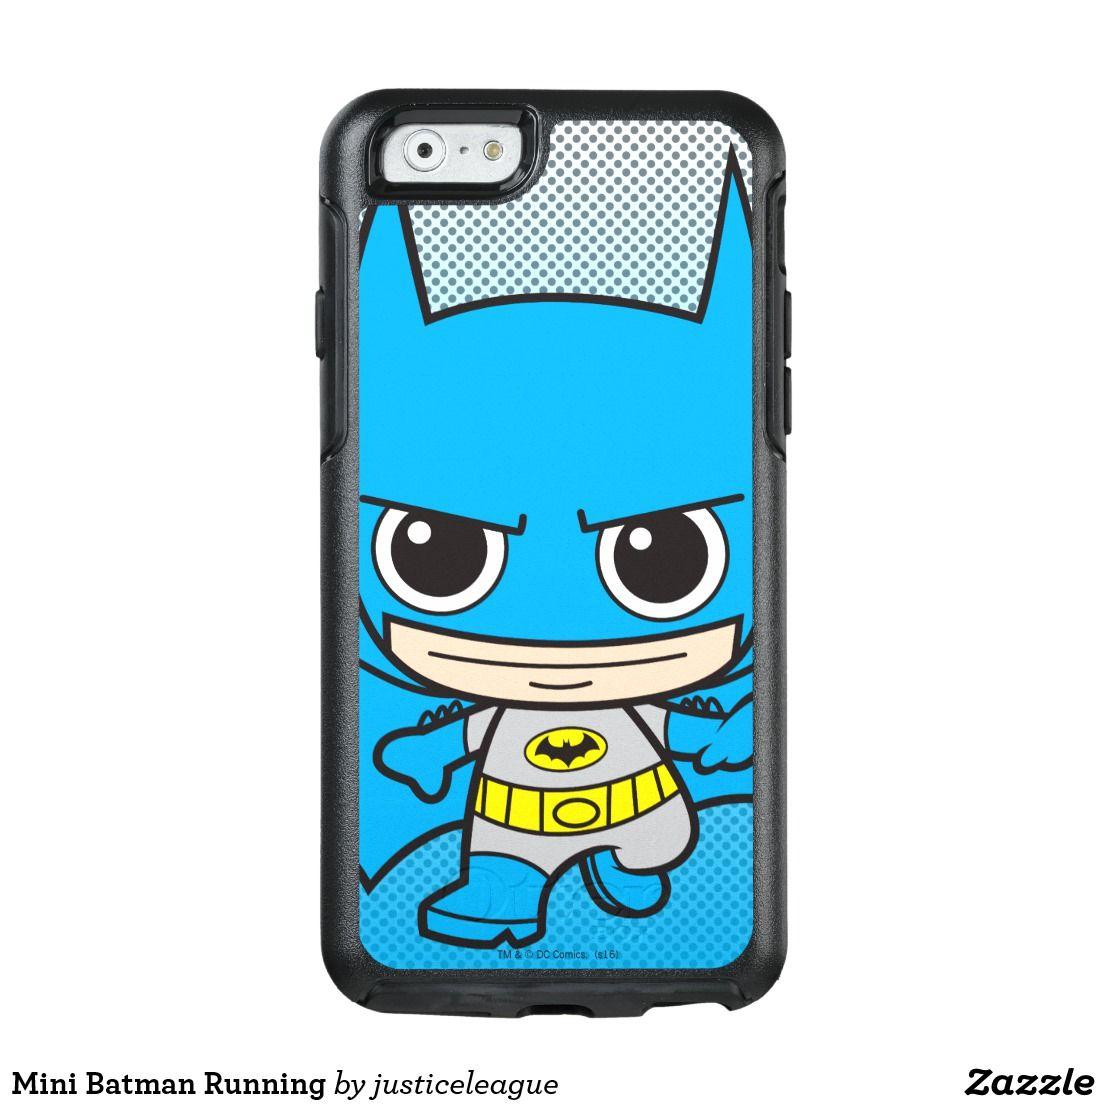 Mini Batman Running OtterBox iPhone Case